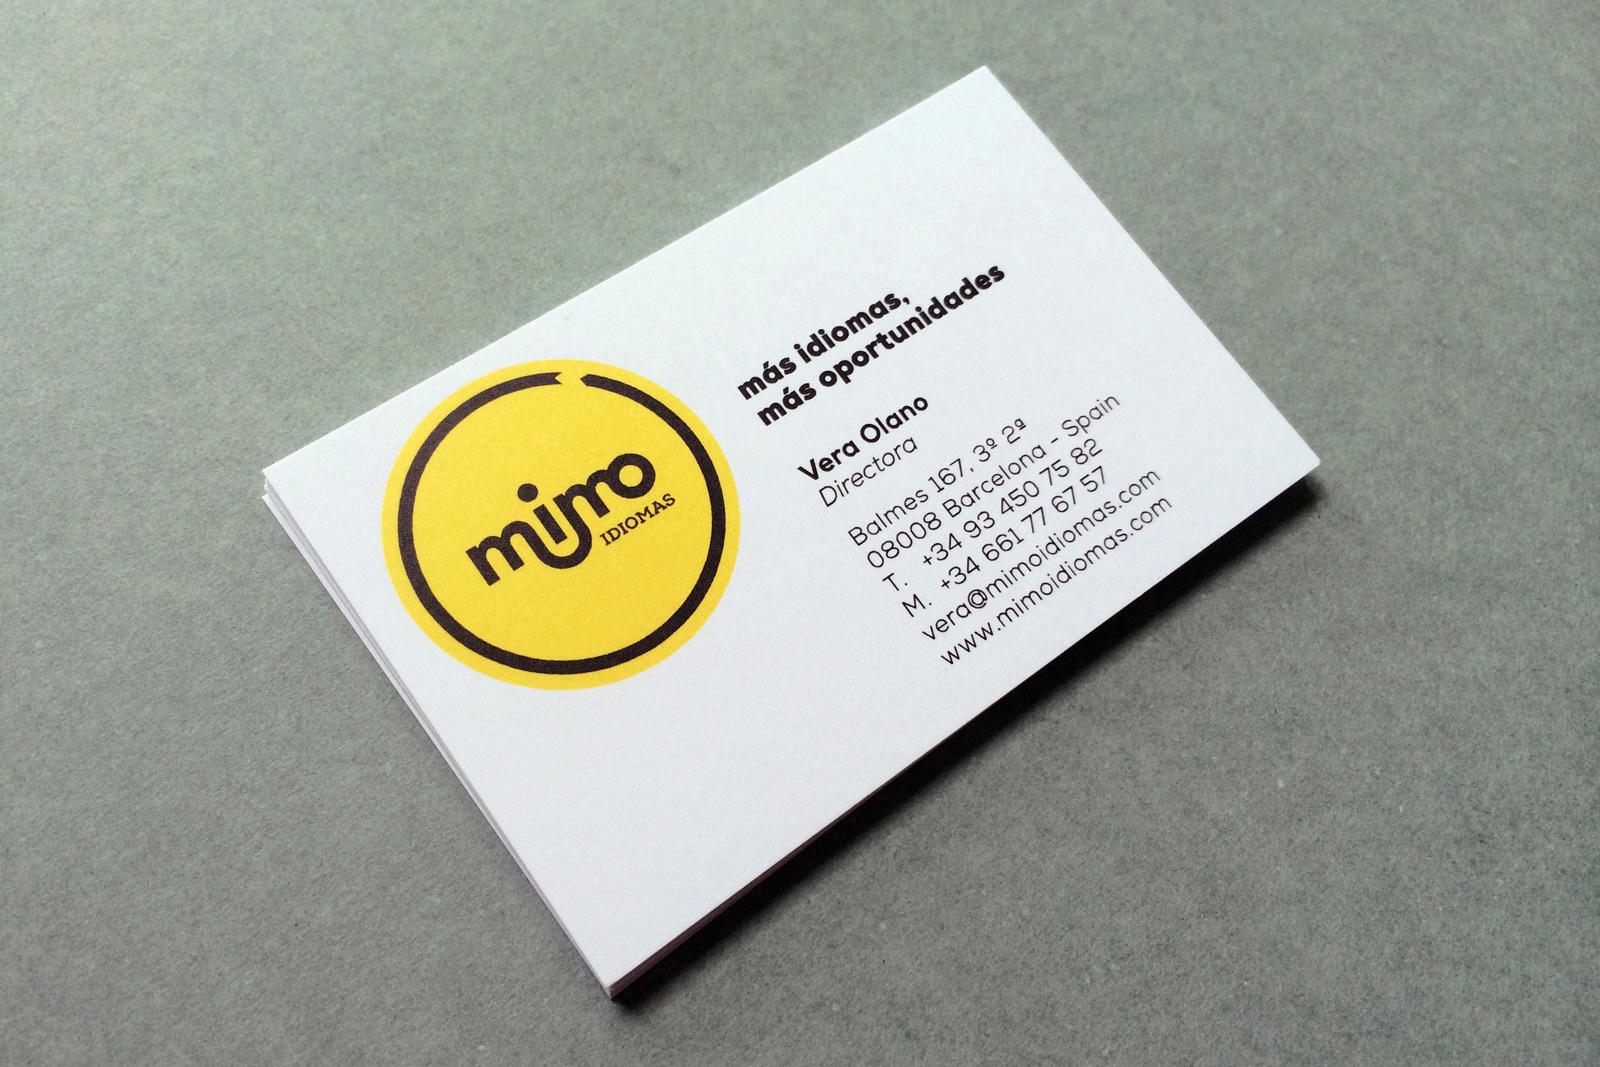 mimo card